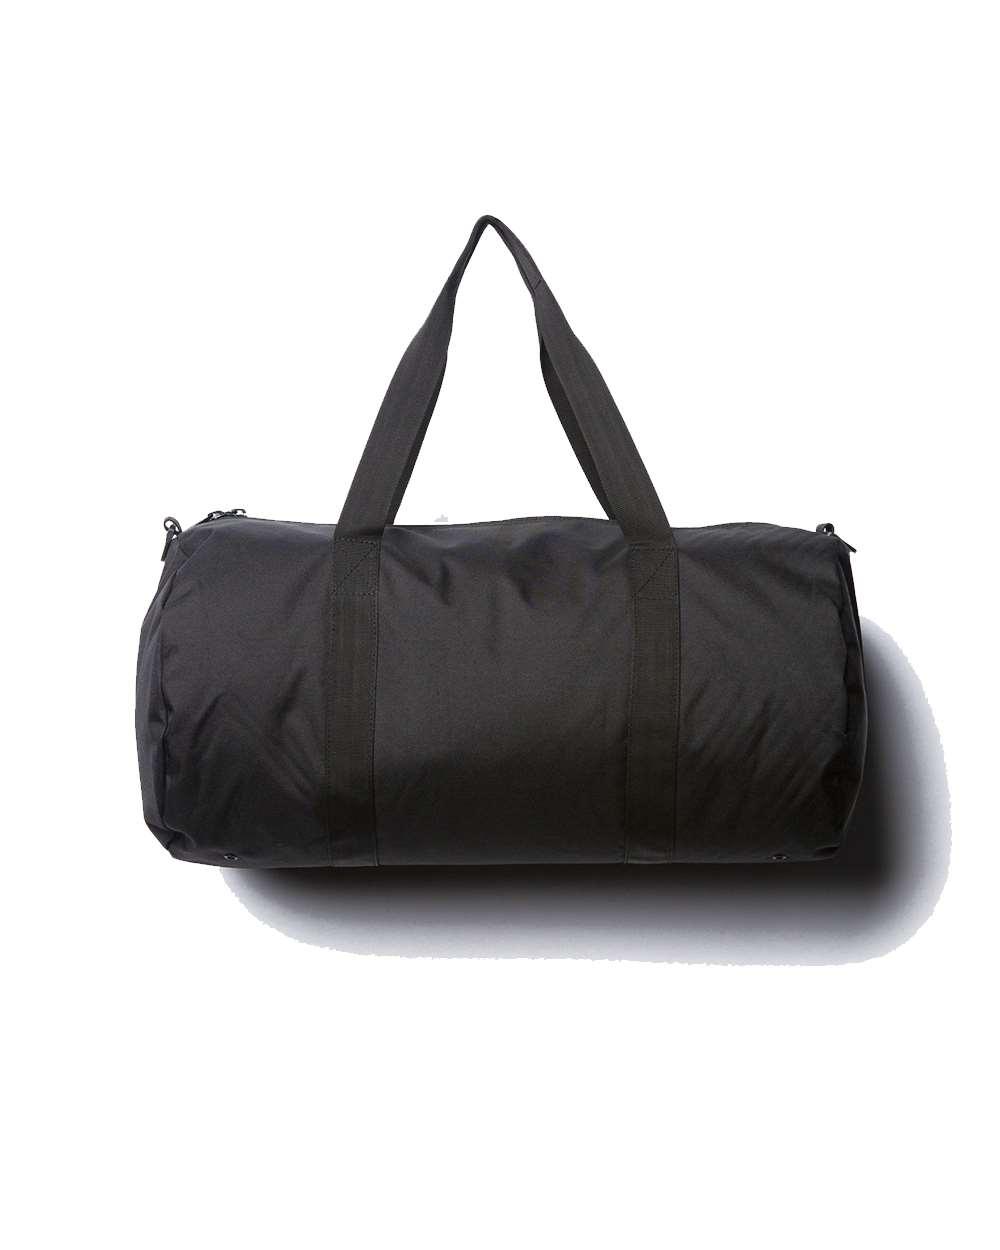 Independent Trading Co. INDDUFBAG - Day Tripper 29L Duffel Bag